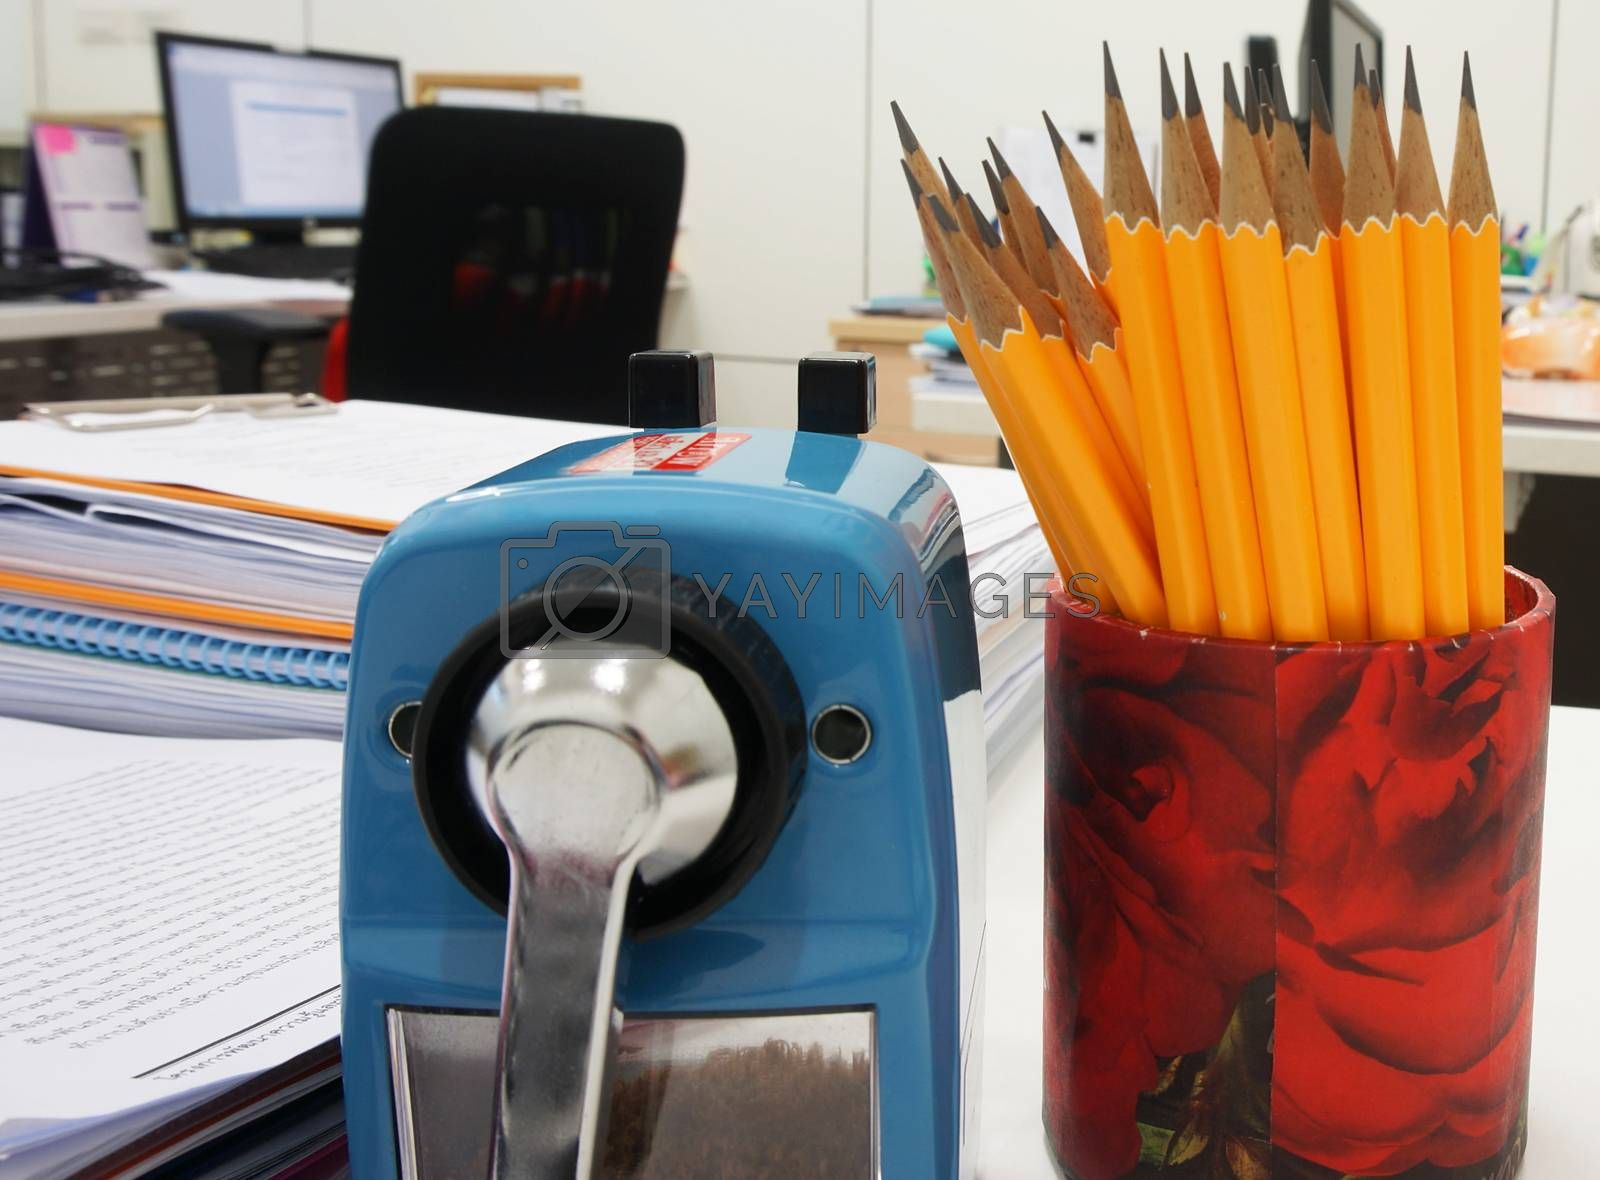 Office supplies on desk have document clip board ,document, pensil, sharpener etc.